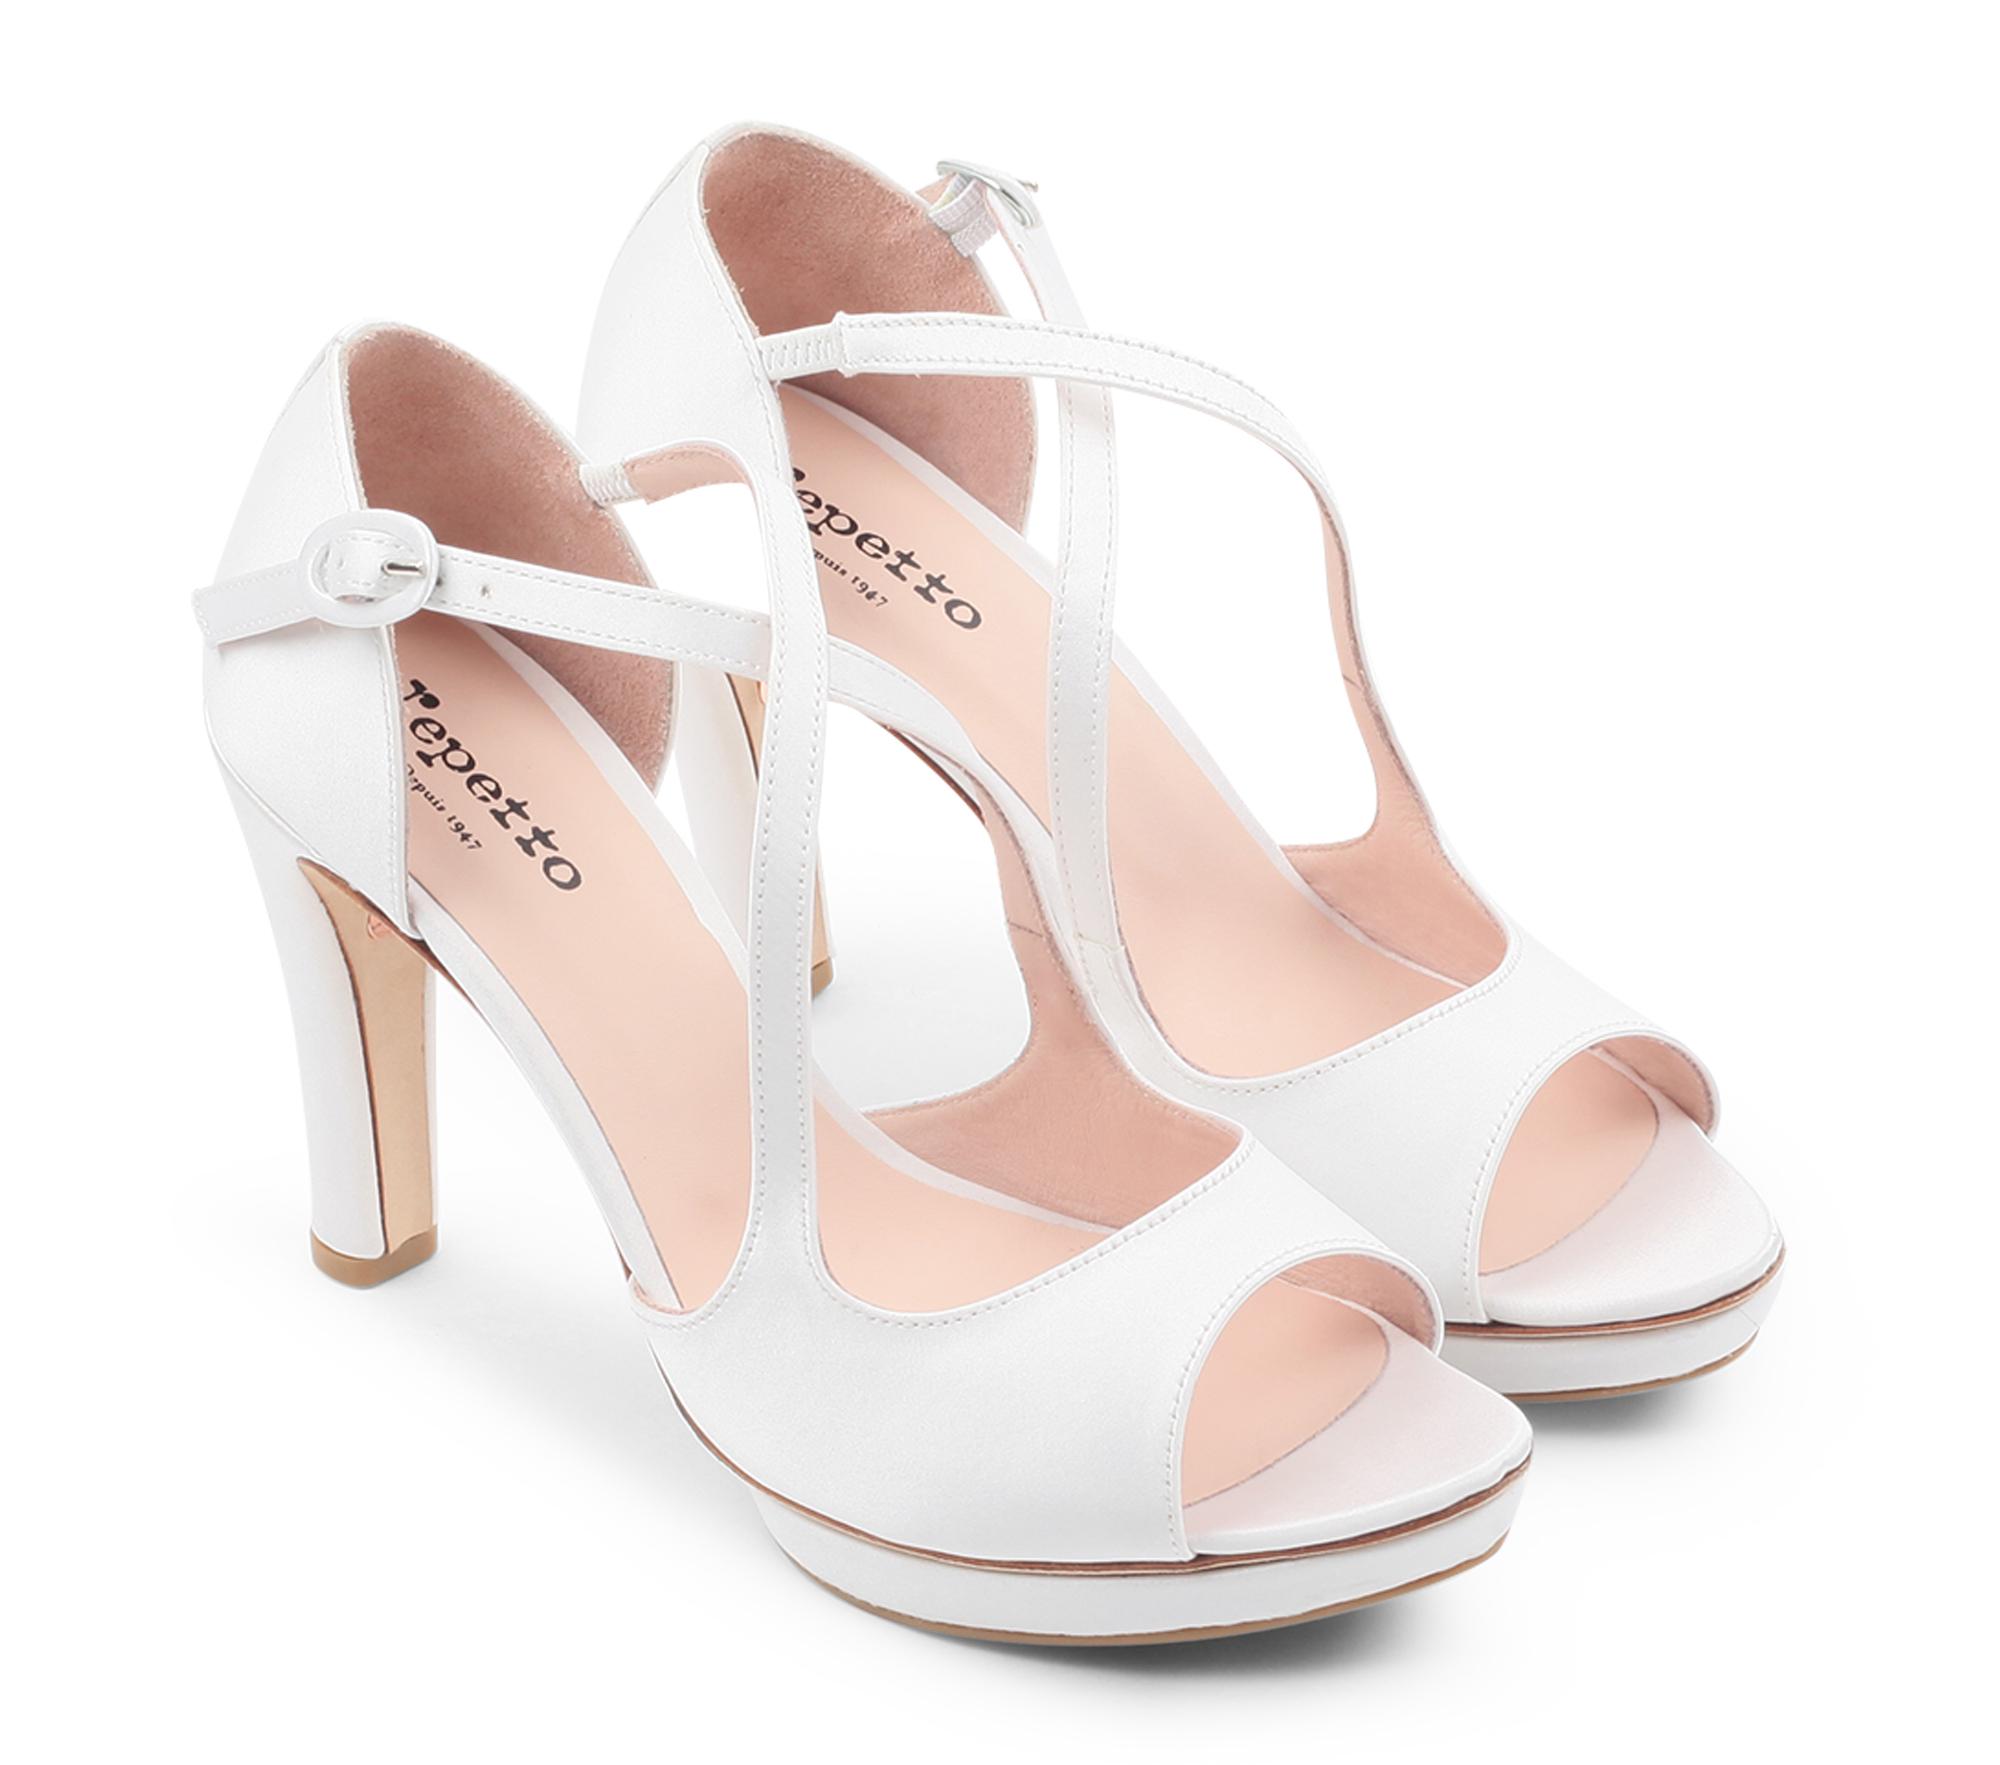 Lolita sandals